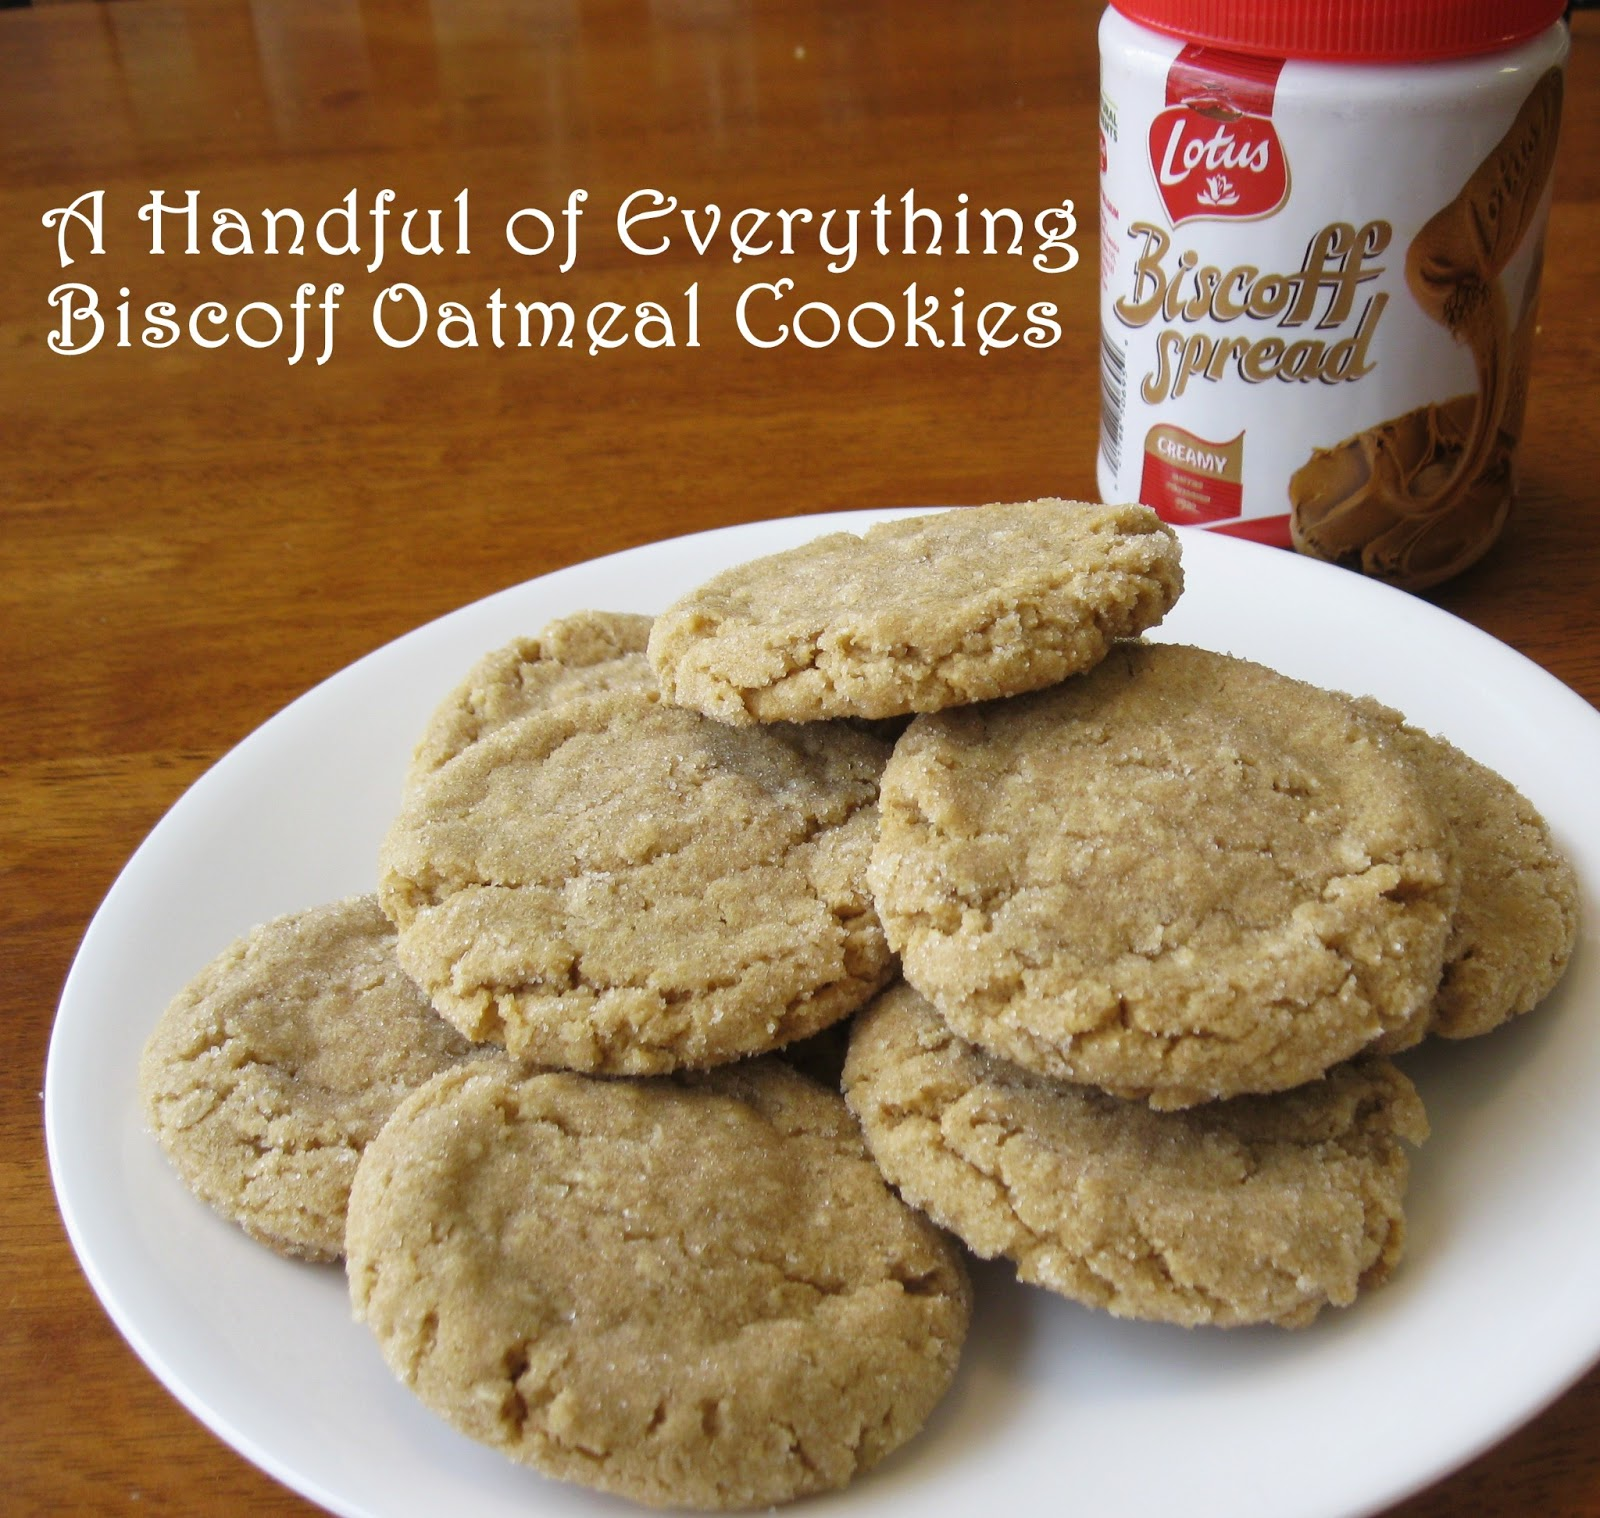 oatmeal cookies the best oatmeal cookies biscoff oatmeal cookie ...